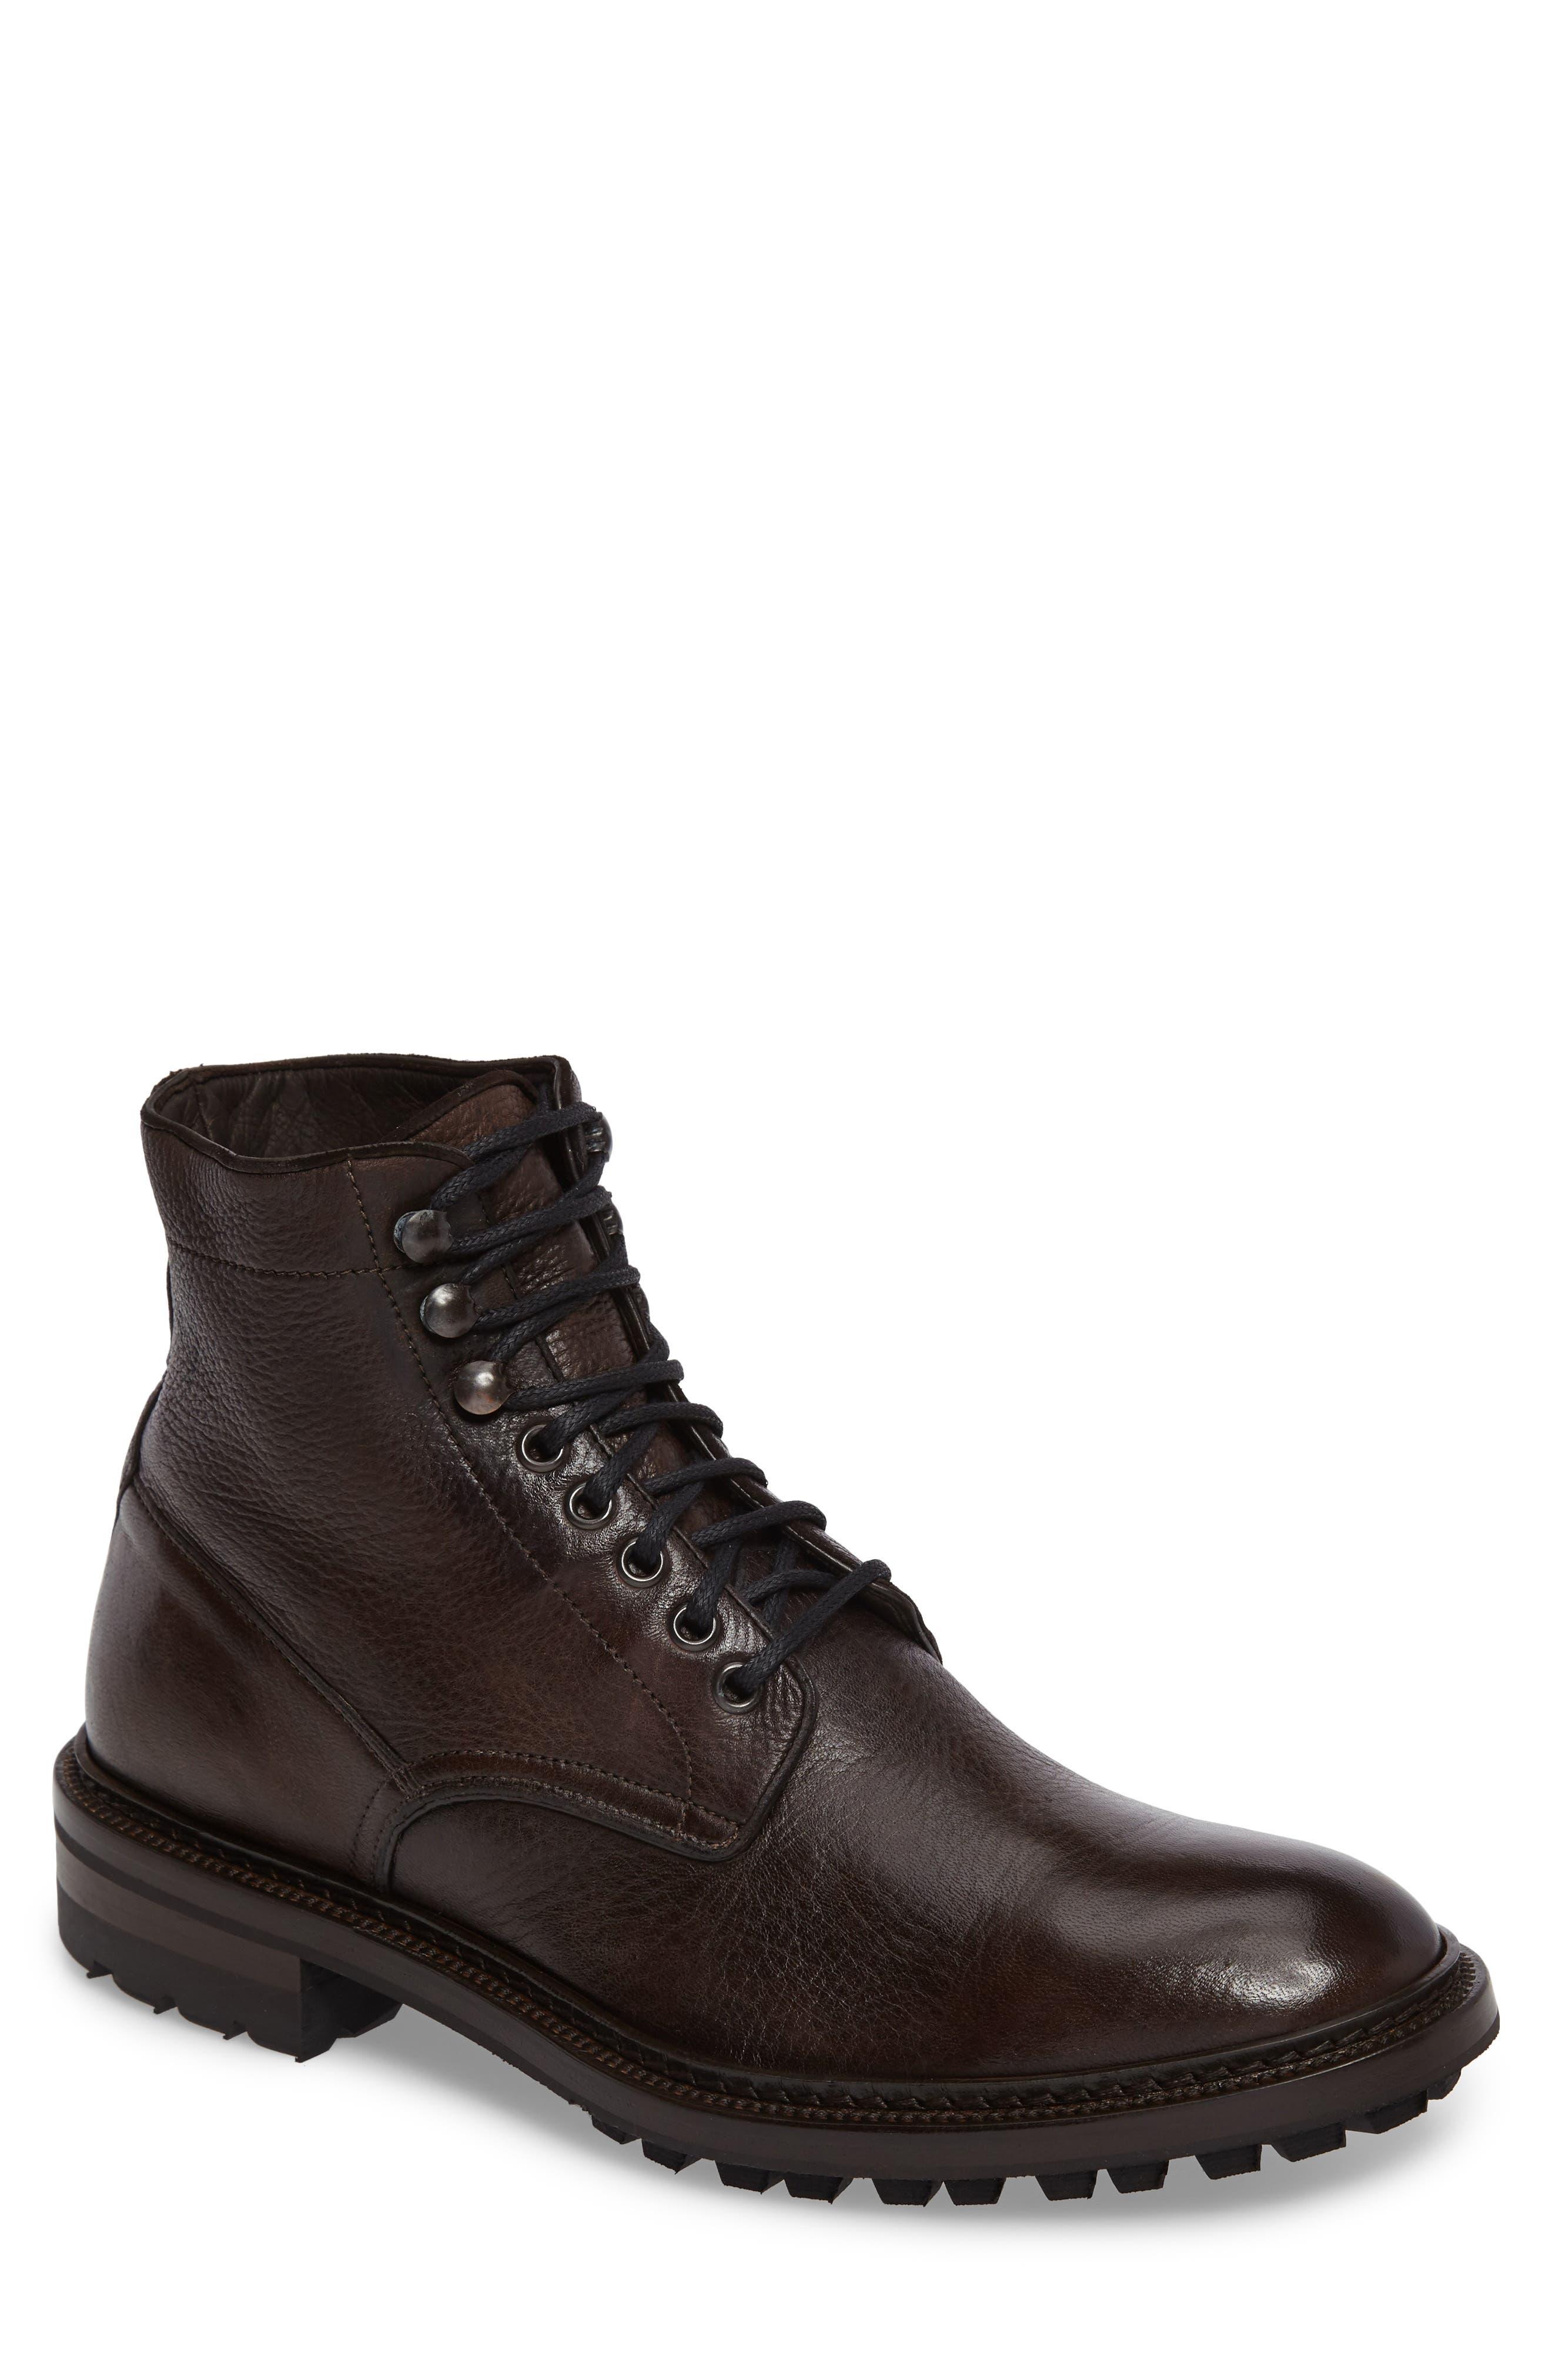 Greyson Plain Toe Boot,                             Main thumbnail 1, color,                             200